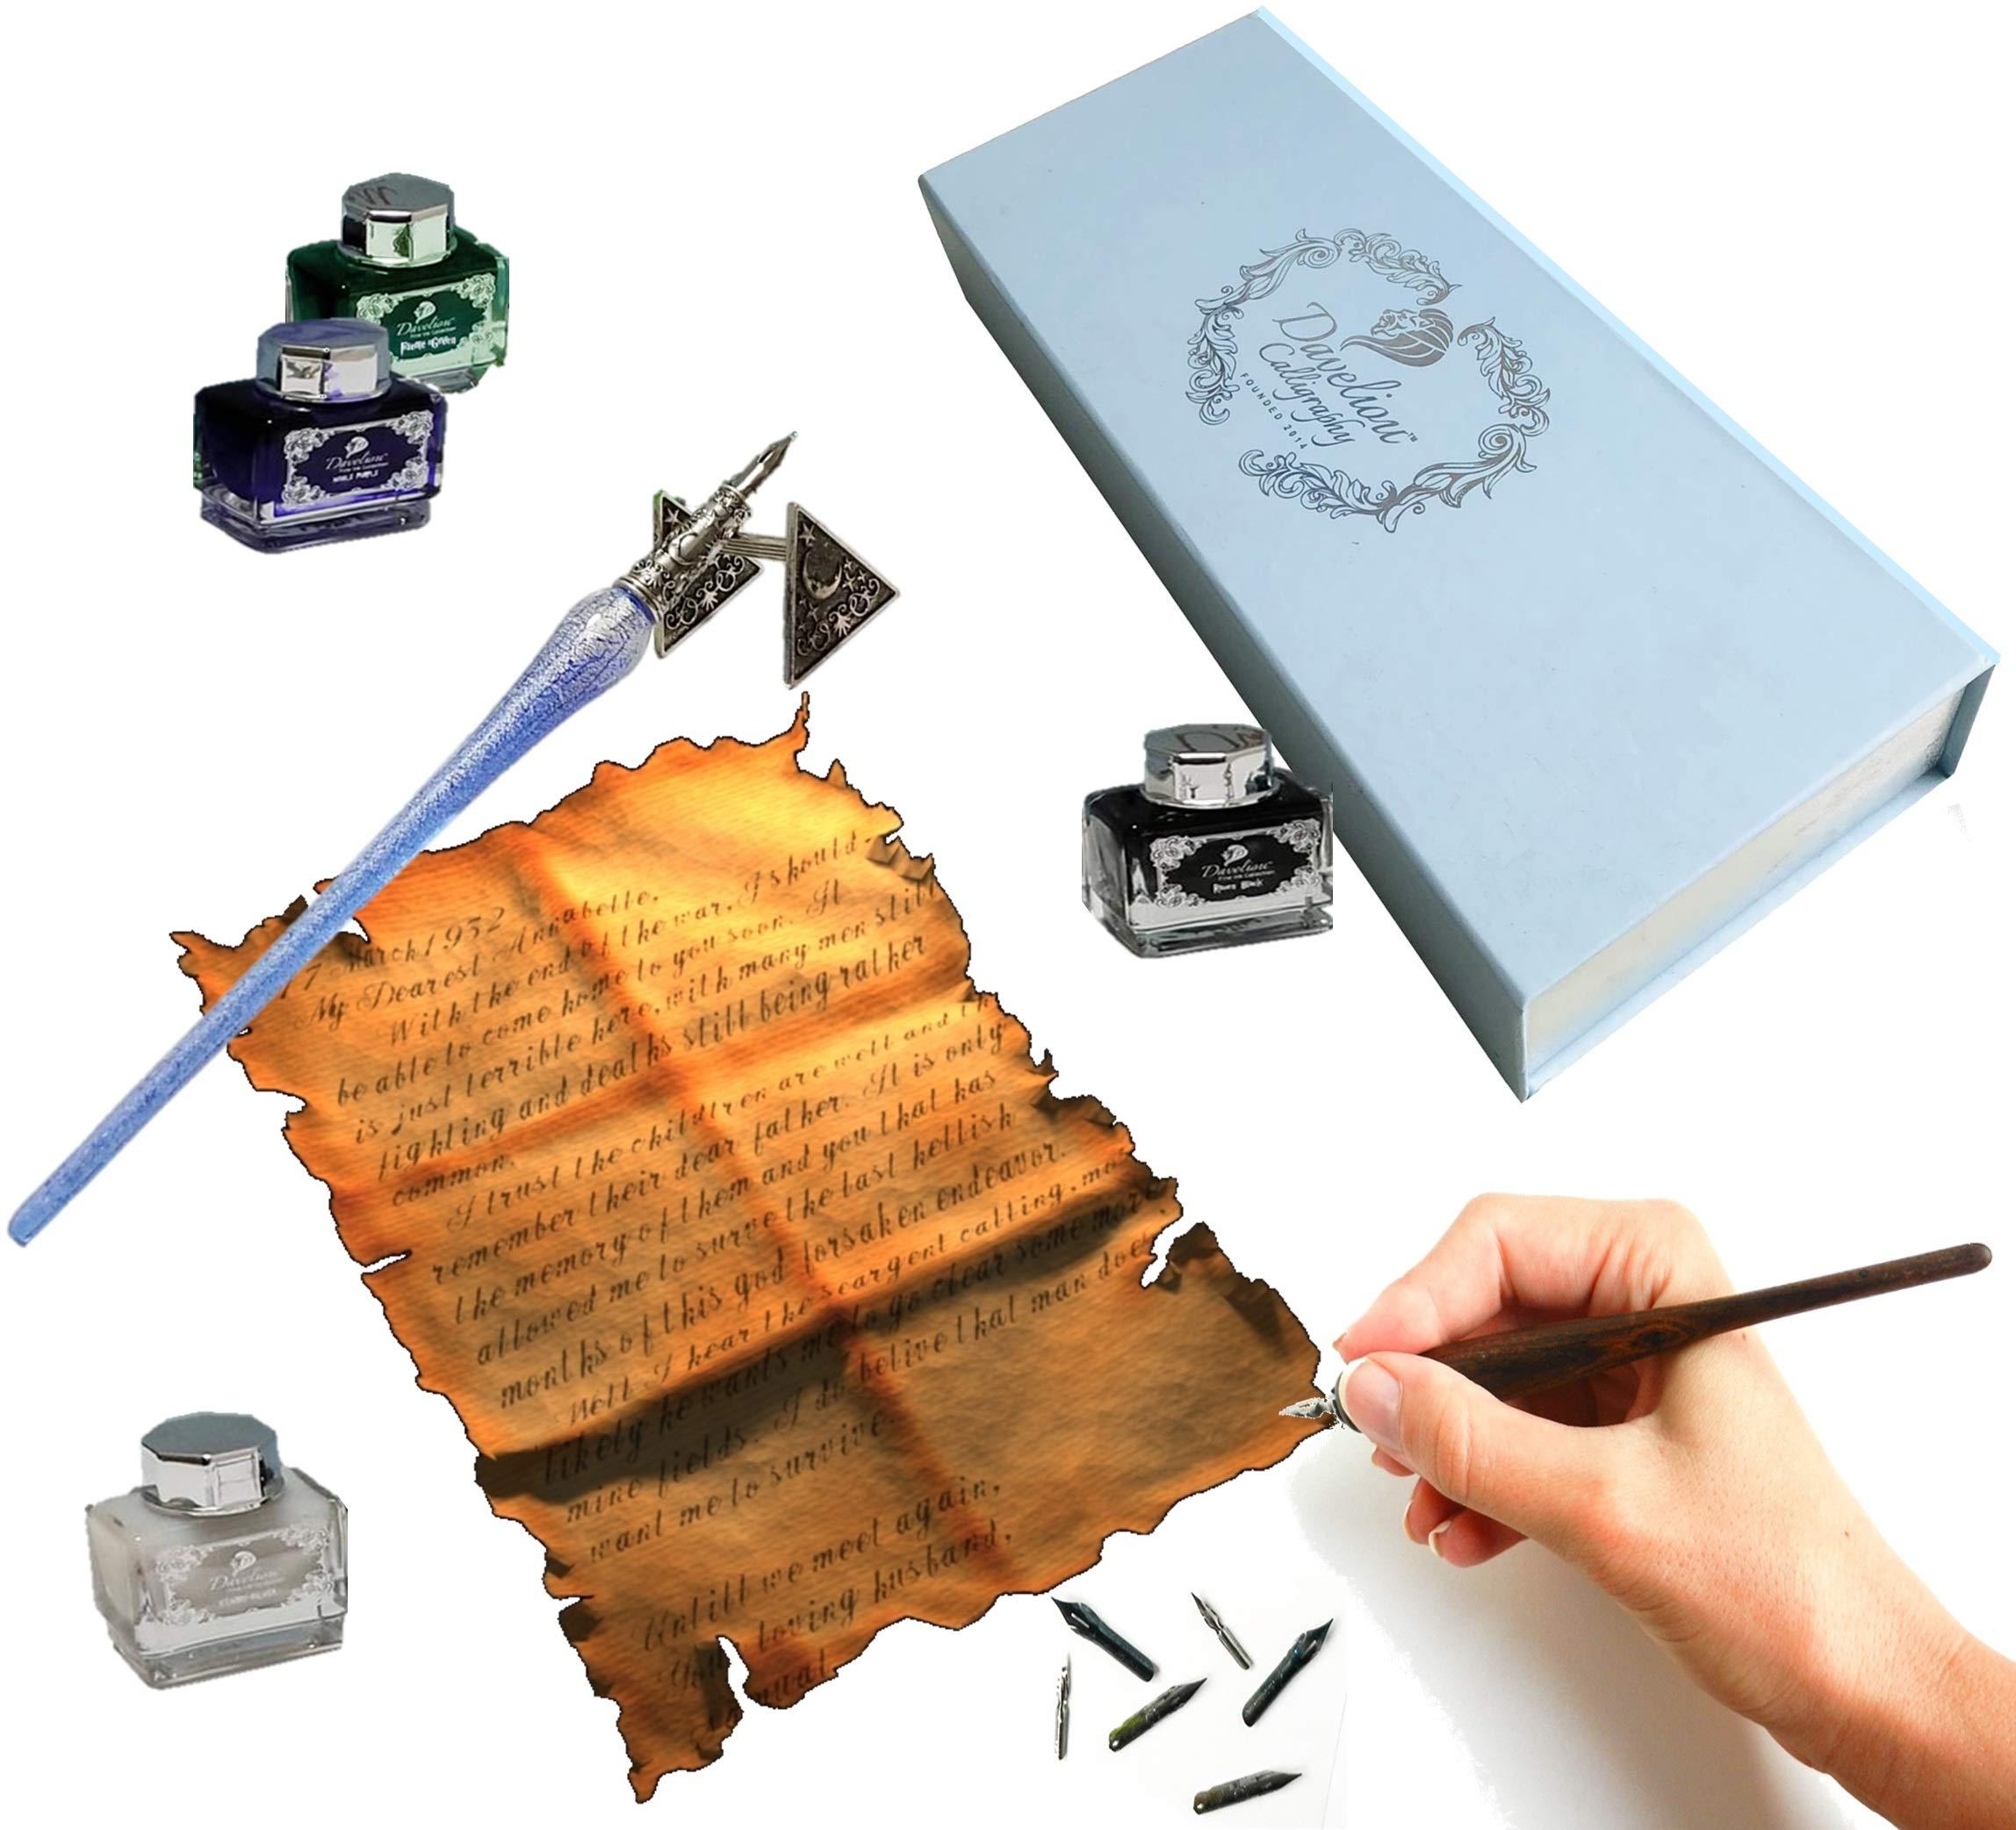 Daveliou Calligraphy Pen Set - 17-Piece Kit - Silver Leaf Blue Glass & Wooden Pens - 10 Nib & 4 Ink Set - Superior Control by Daveliou (Image #9)